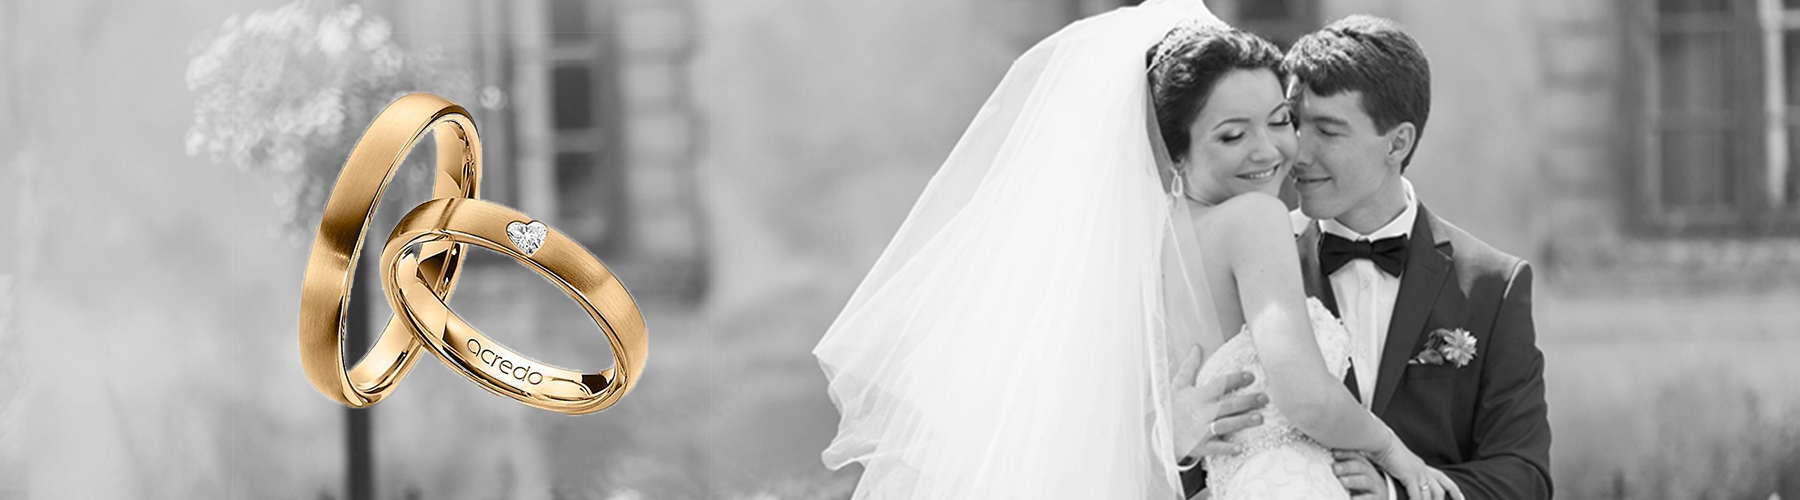 Alianzas de boda Classic